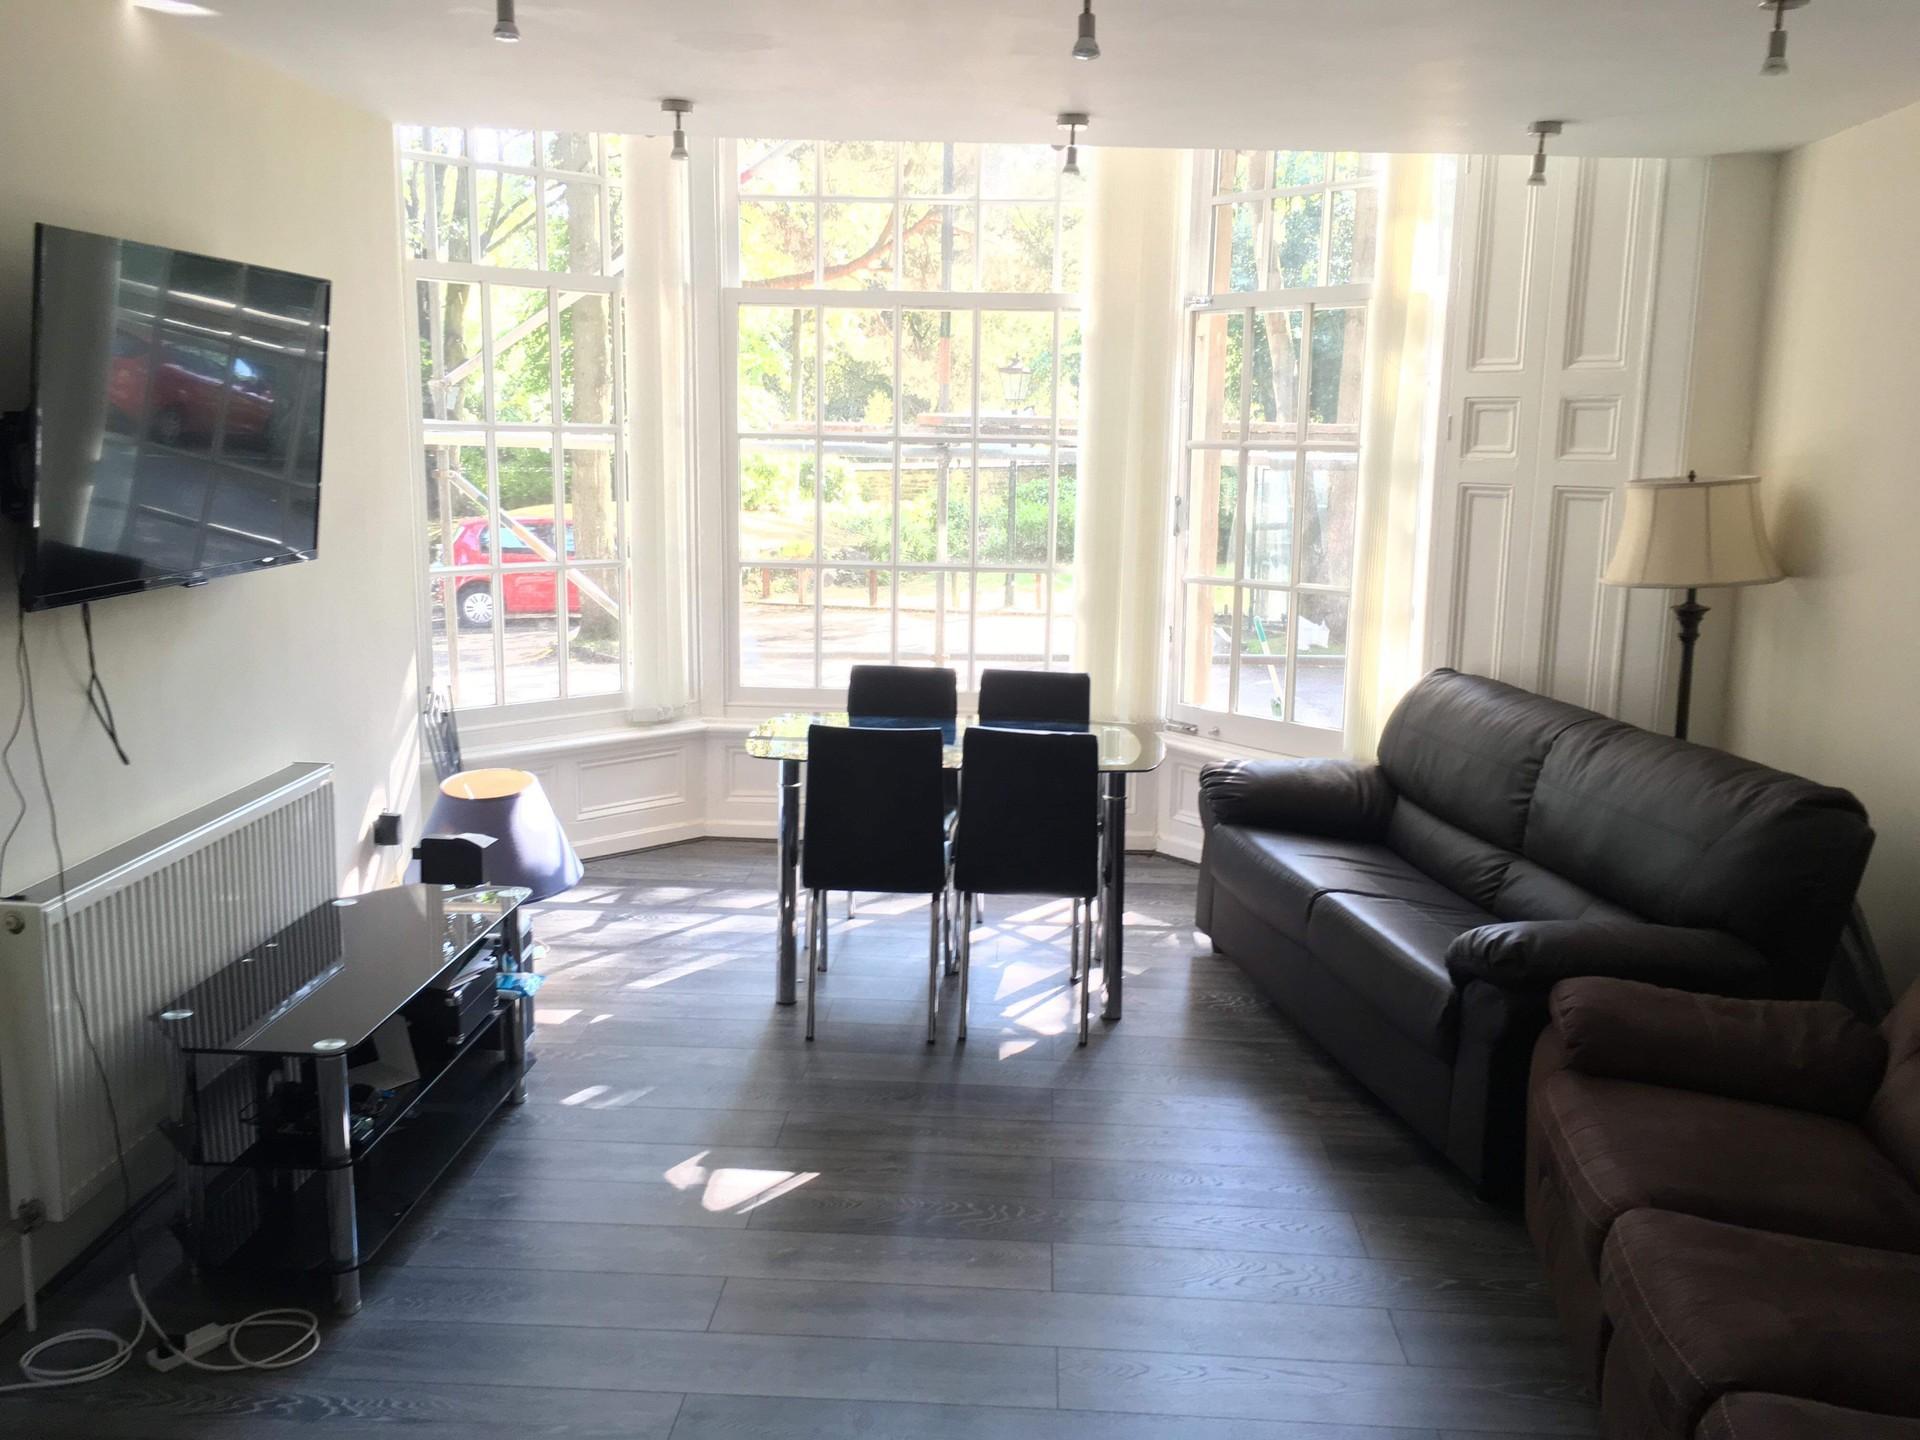 large-en-suite-double-bedroom-1f8d7bca8b7298ba68364f1f8932b483